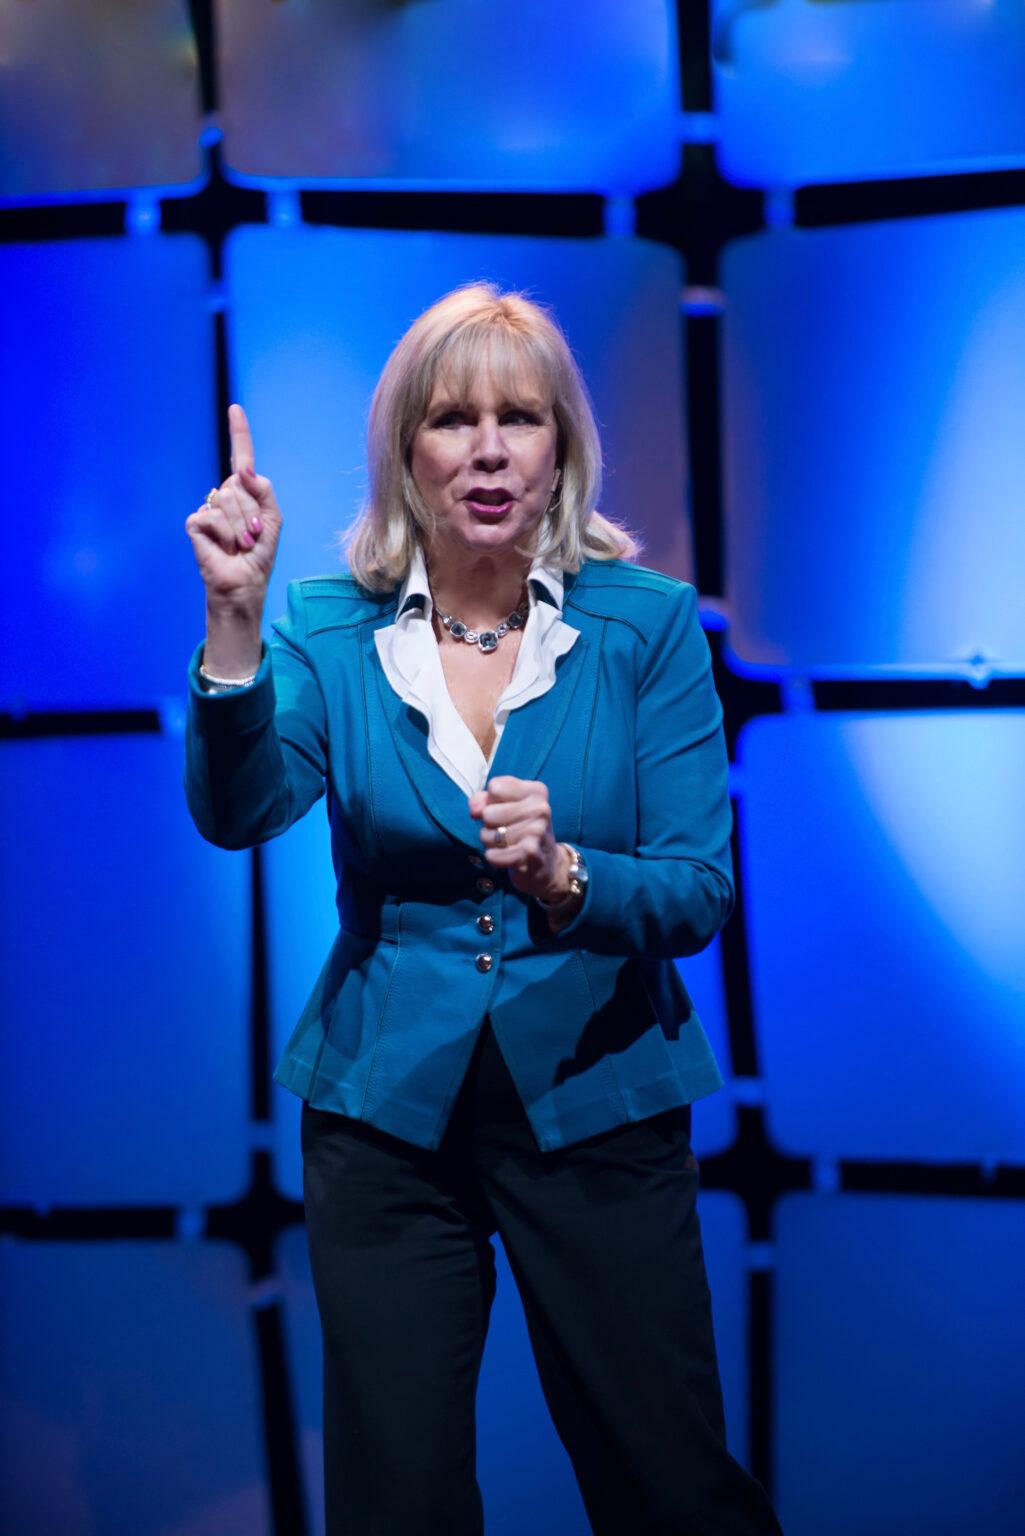 Motivational Speaker Linda Larsen on Stage Making a Point High Resolution